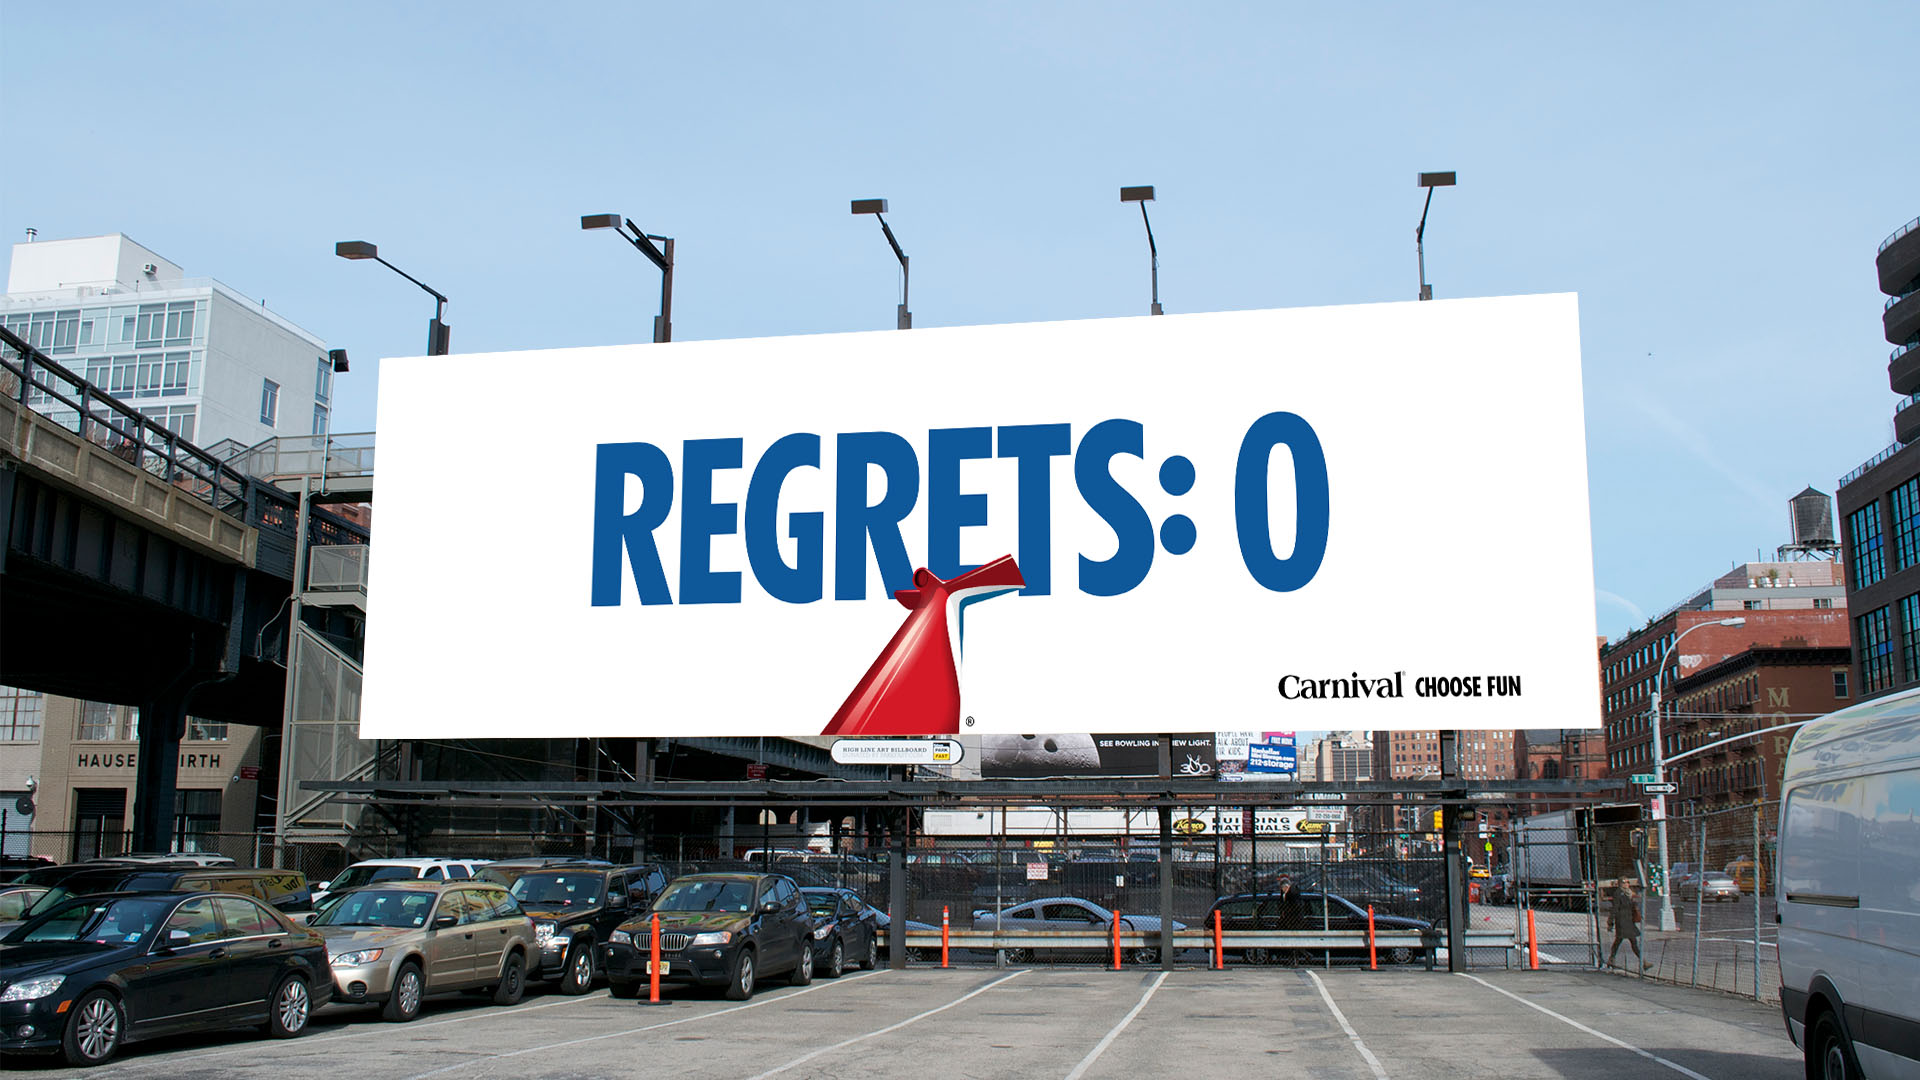 carnival regrets.jpg